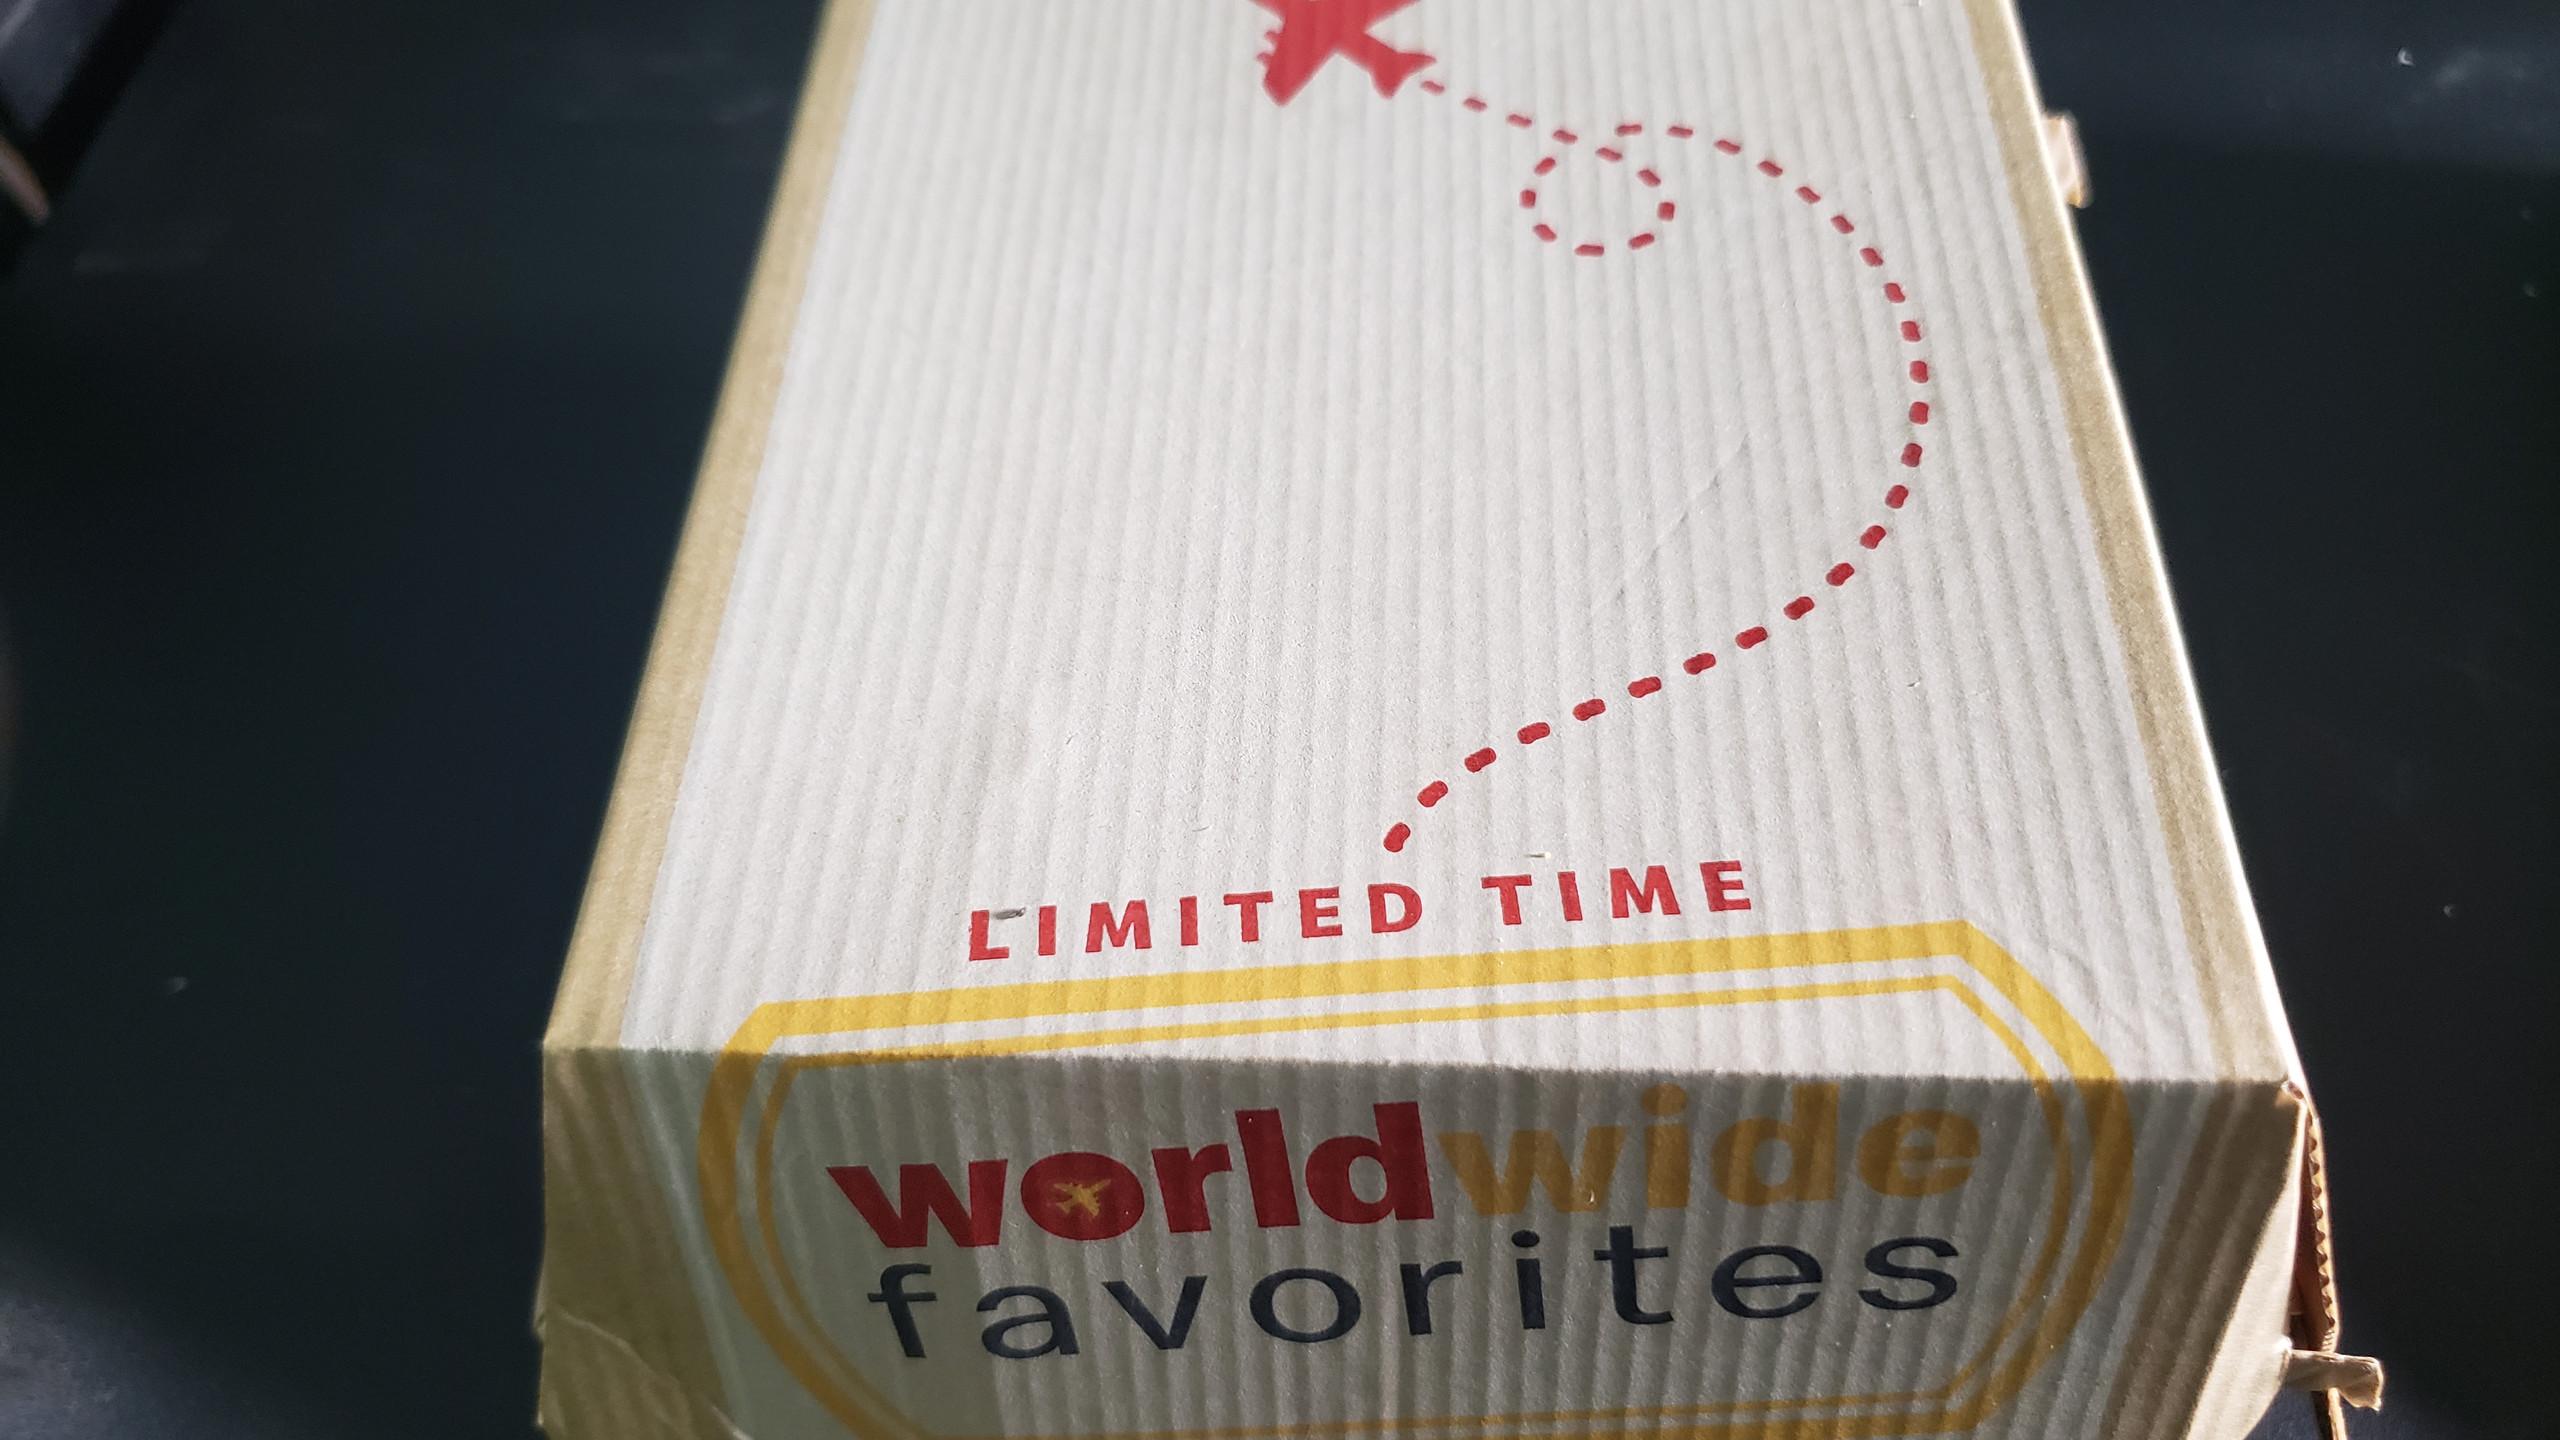 McDonald's Wordwide Favorites Box